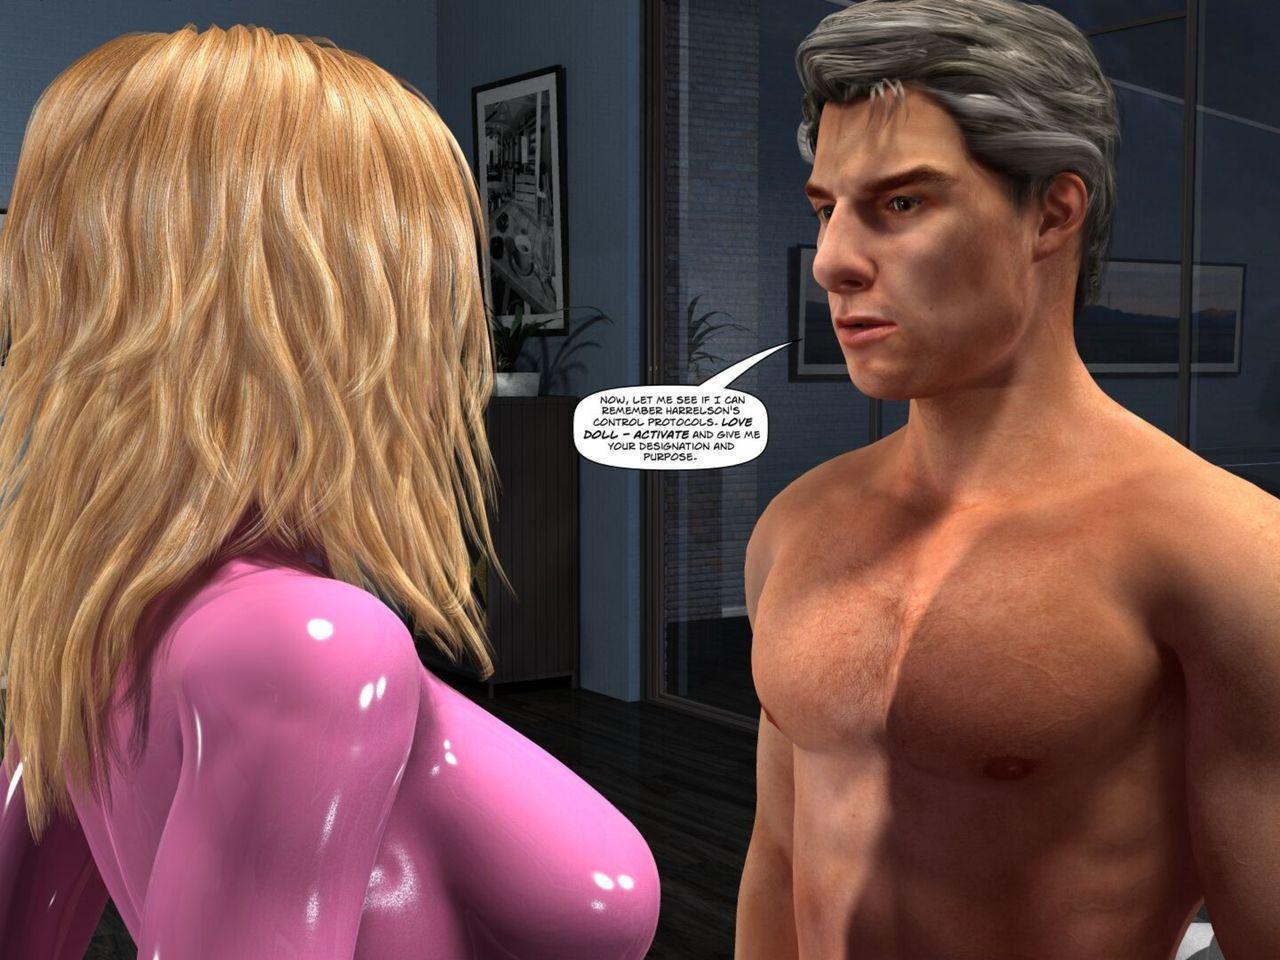 [Telsis] The Sex Toy - part 2